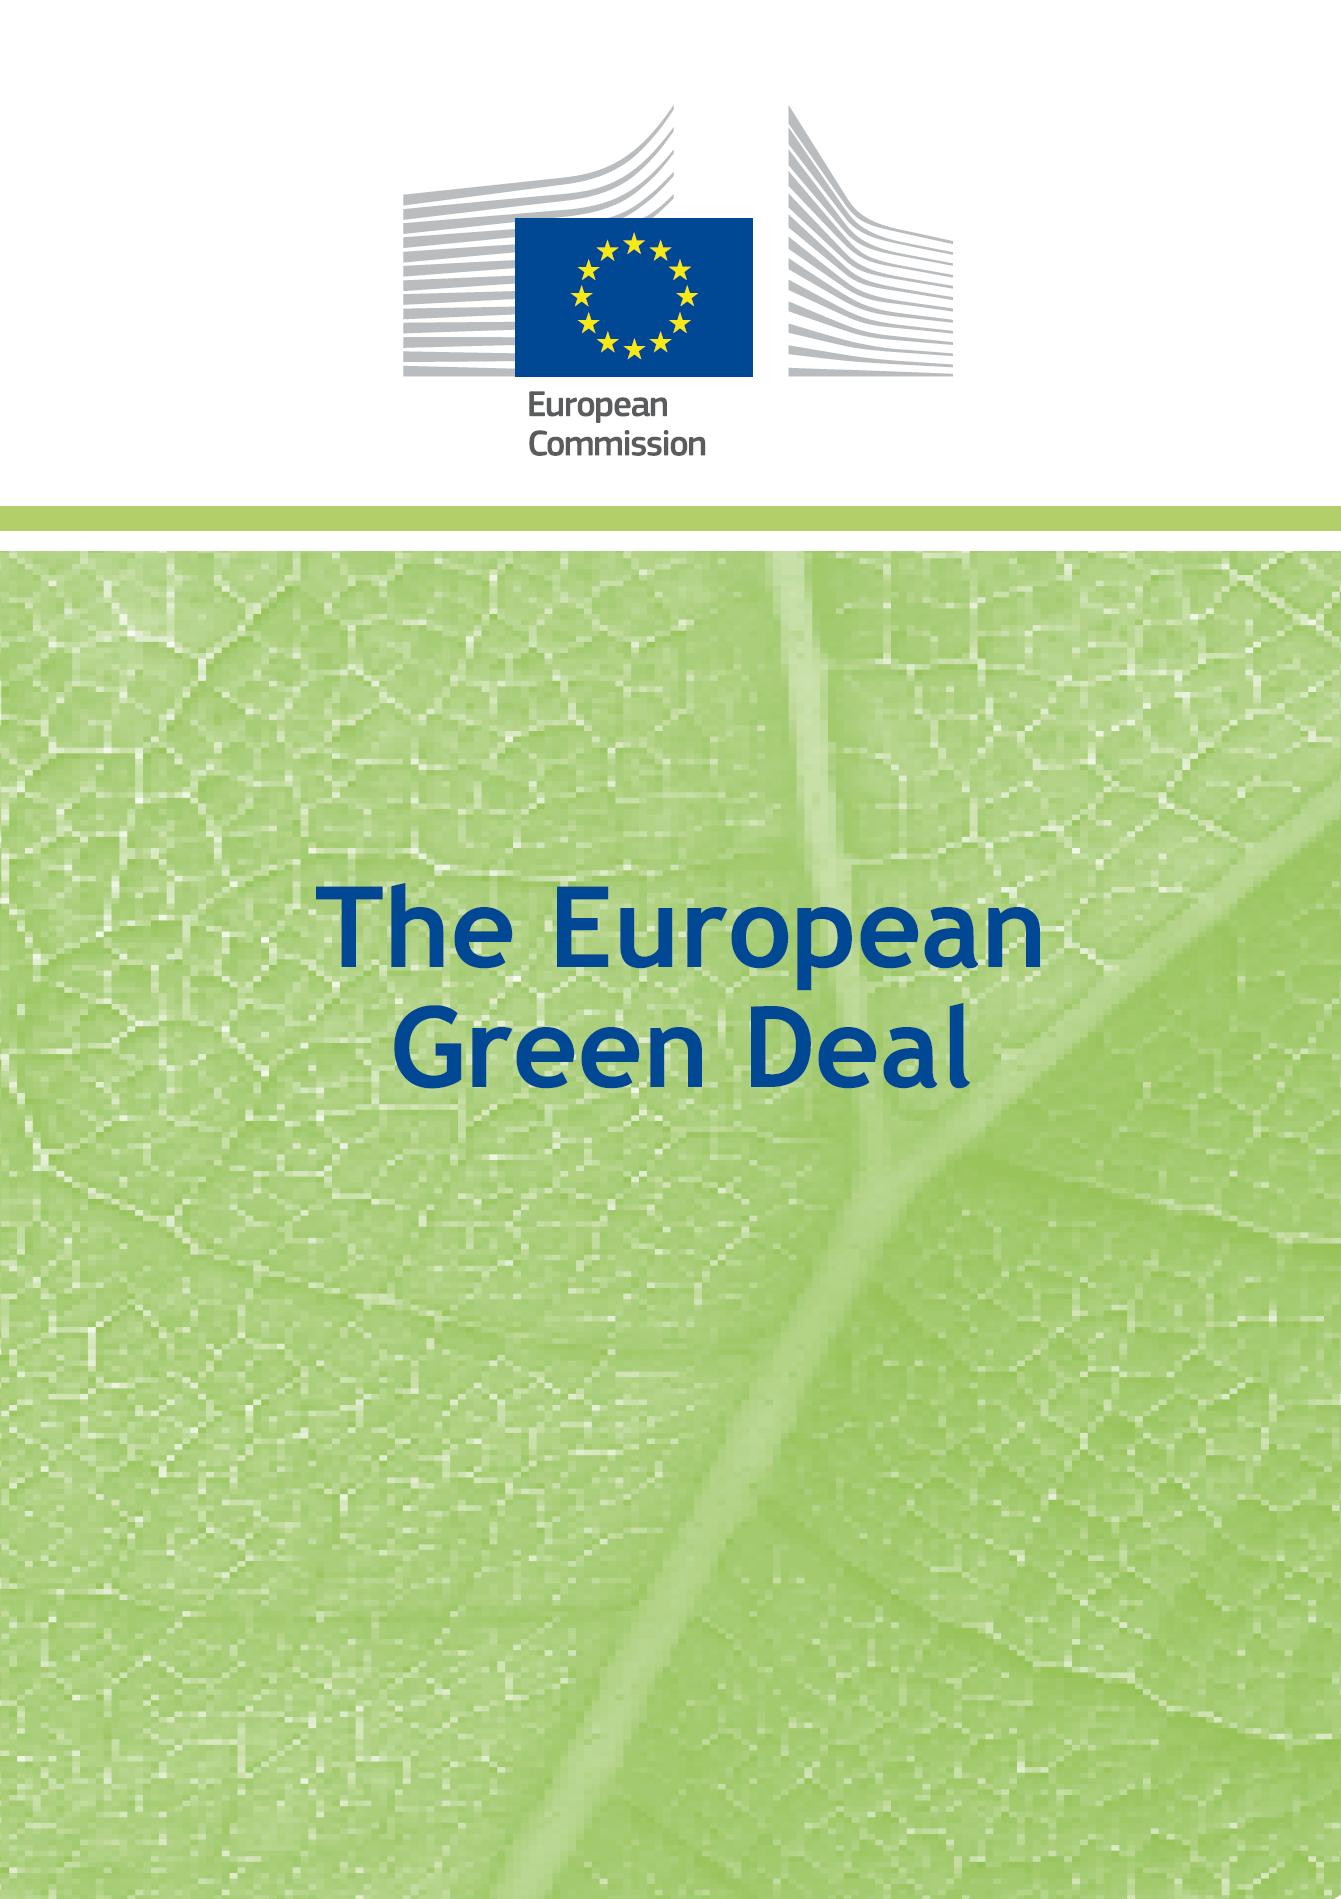 EU Green Deal Cover